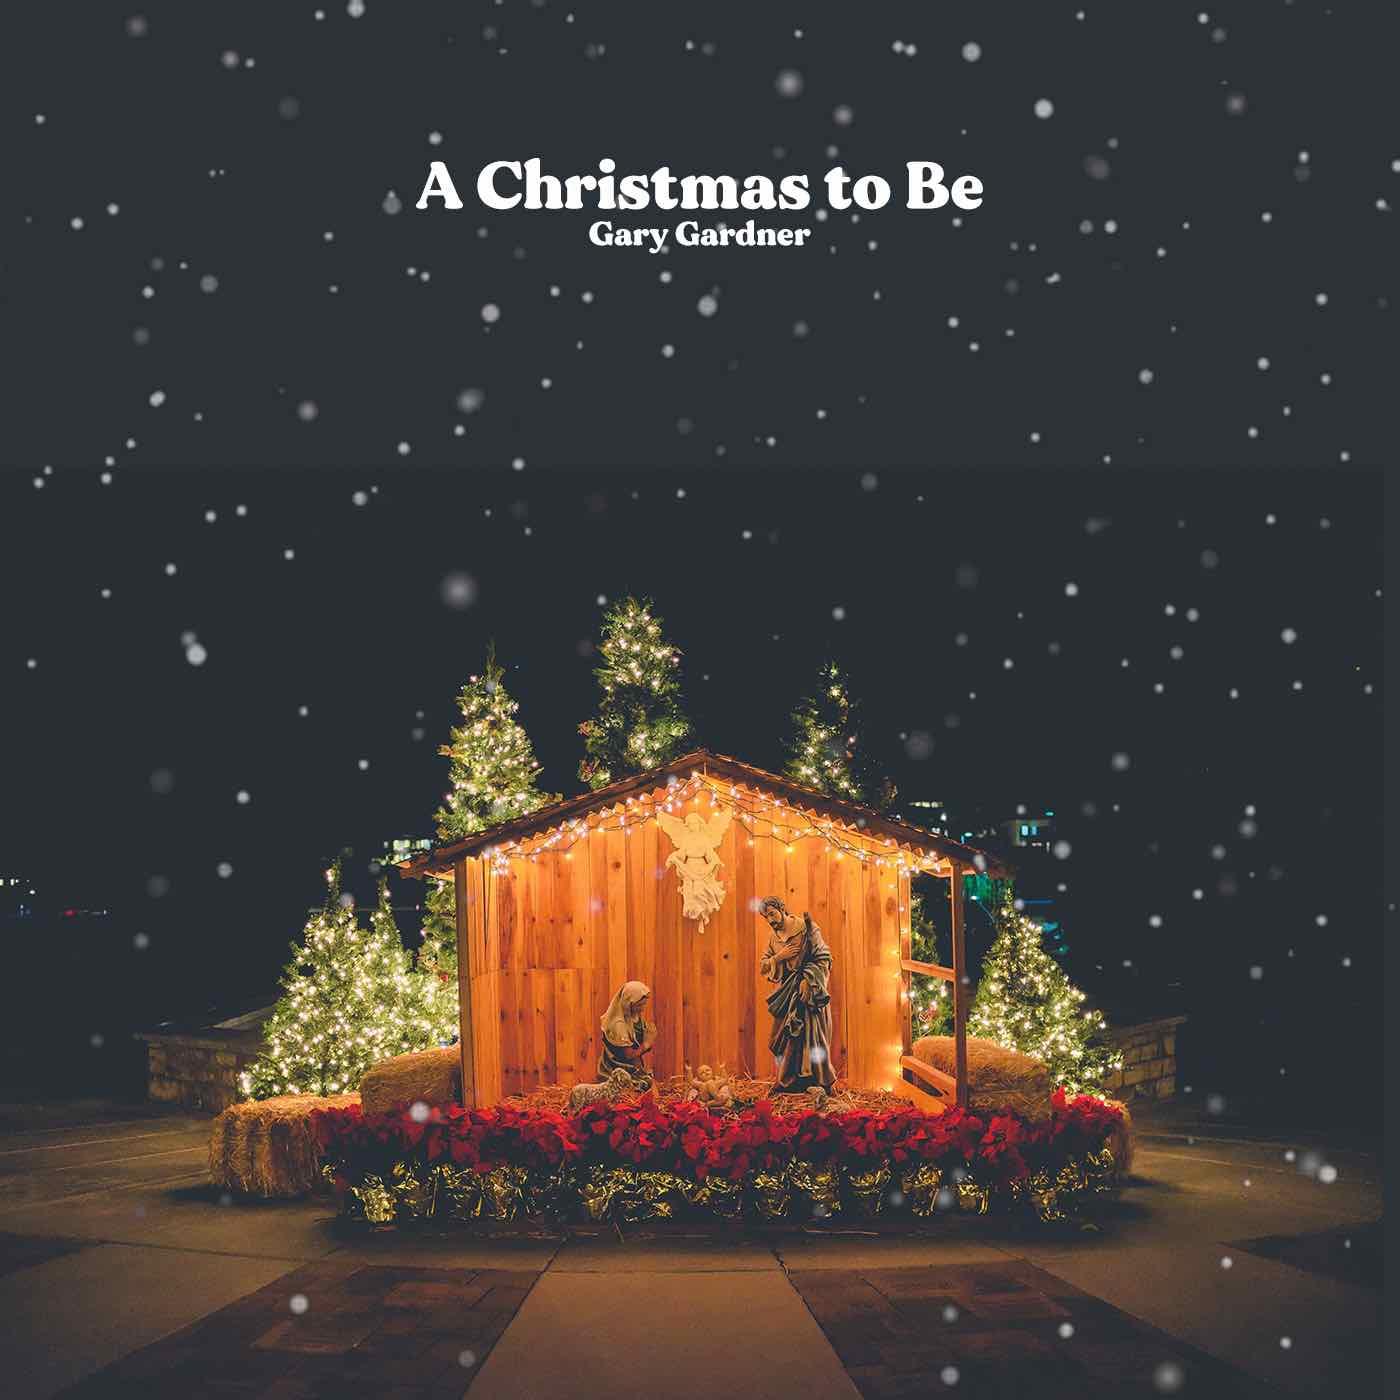 A-Christmas-to-Be-Gary-Gardner